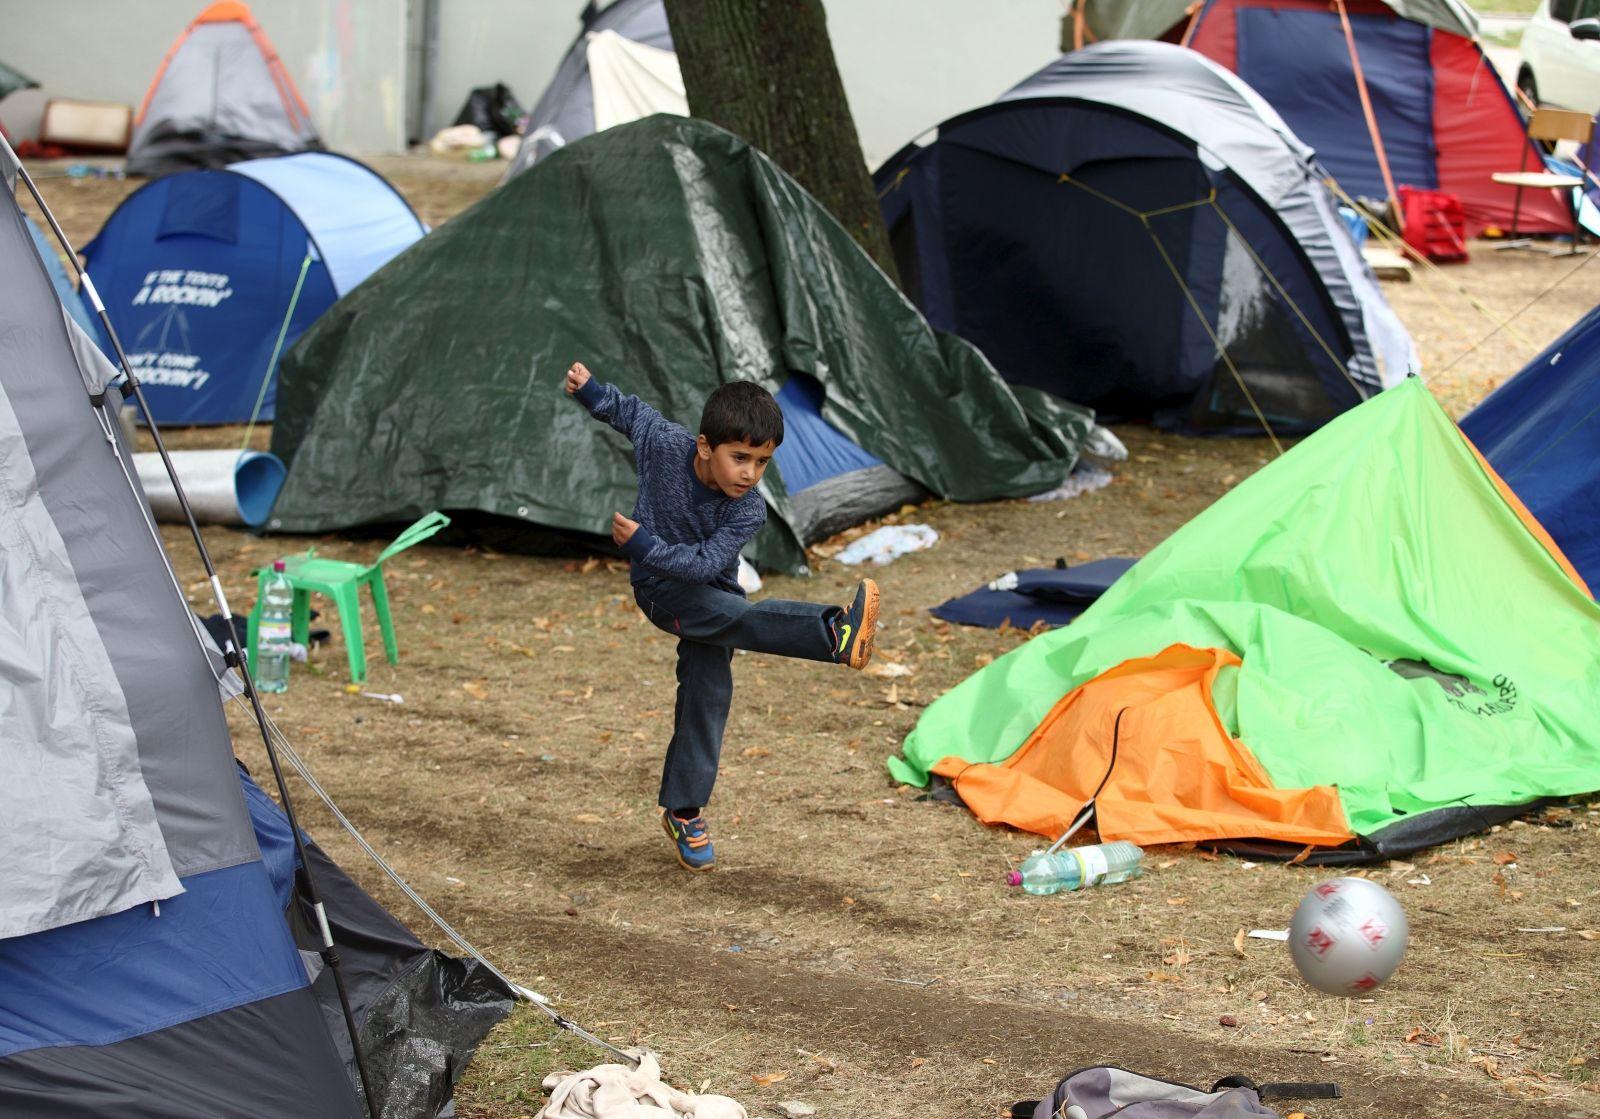 Refugees in Austria